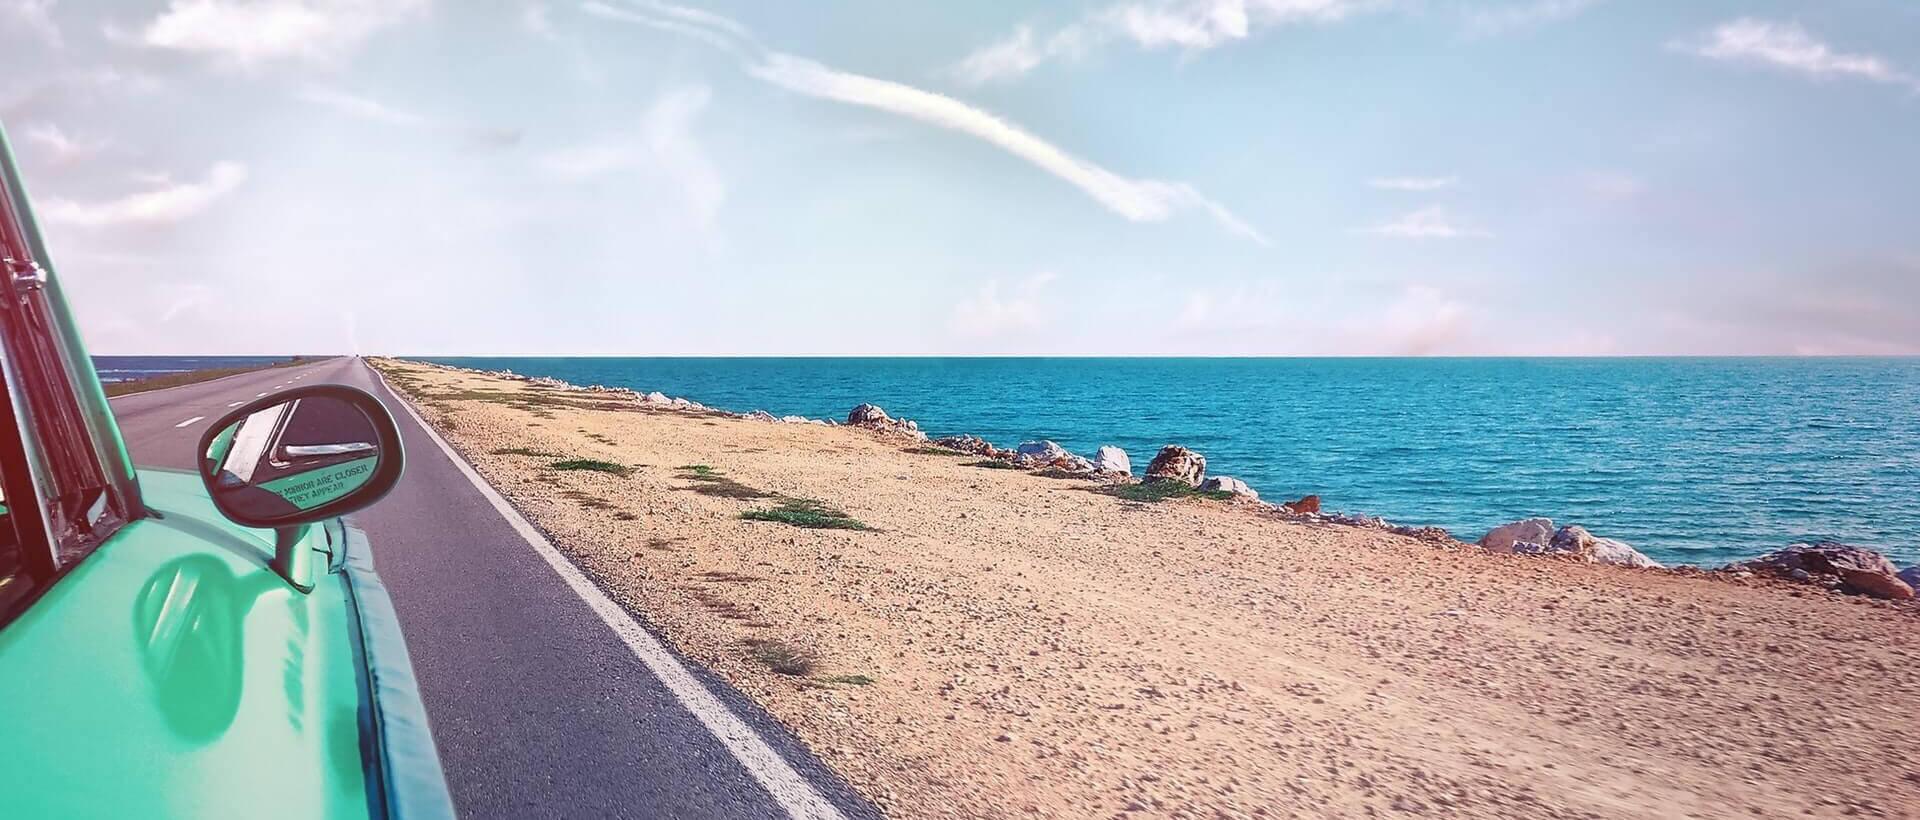 Maistros Van Transfer & Rent a car services in Paros